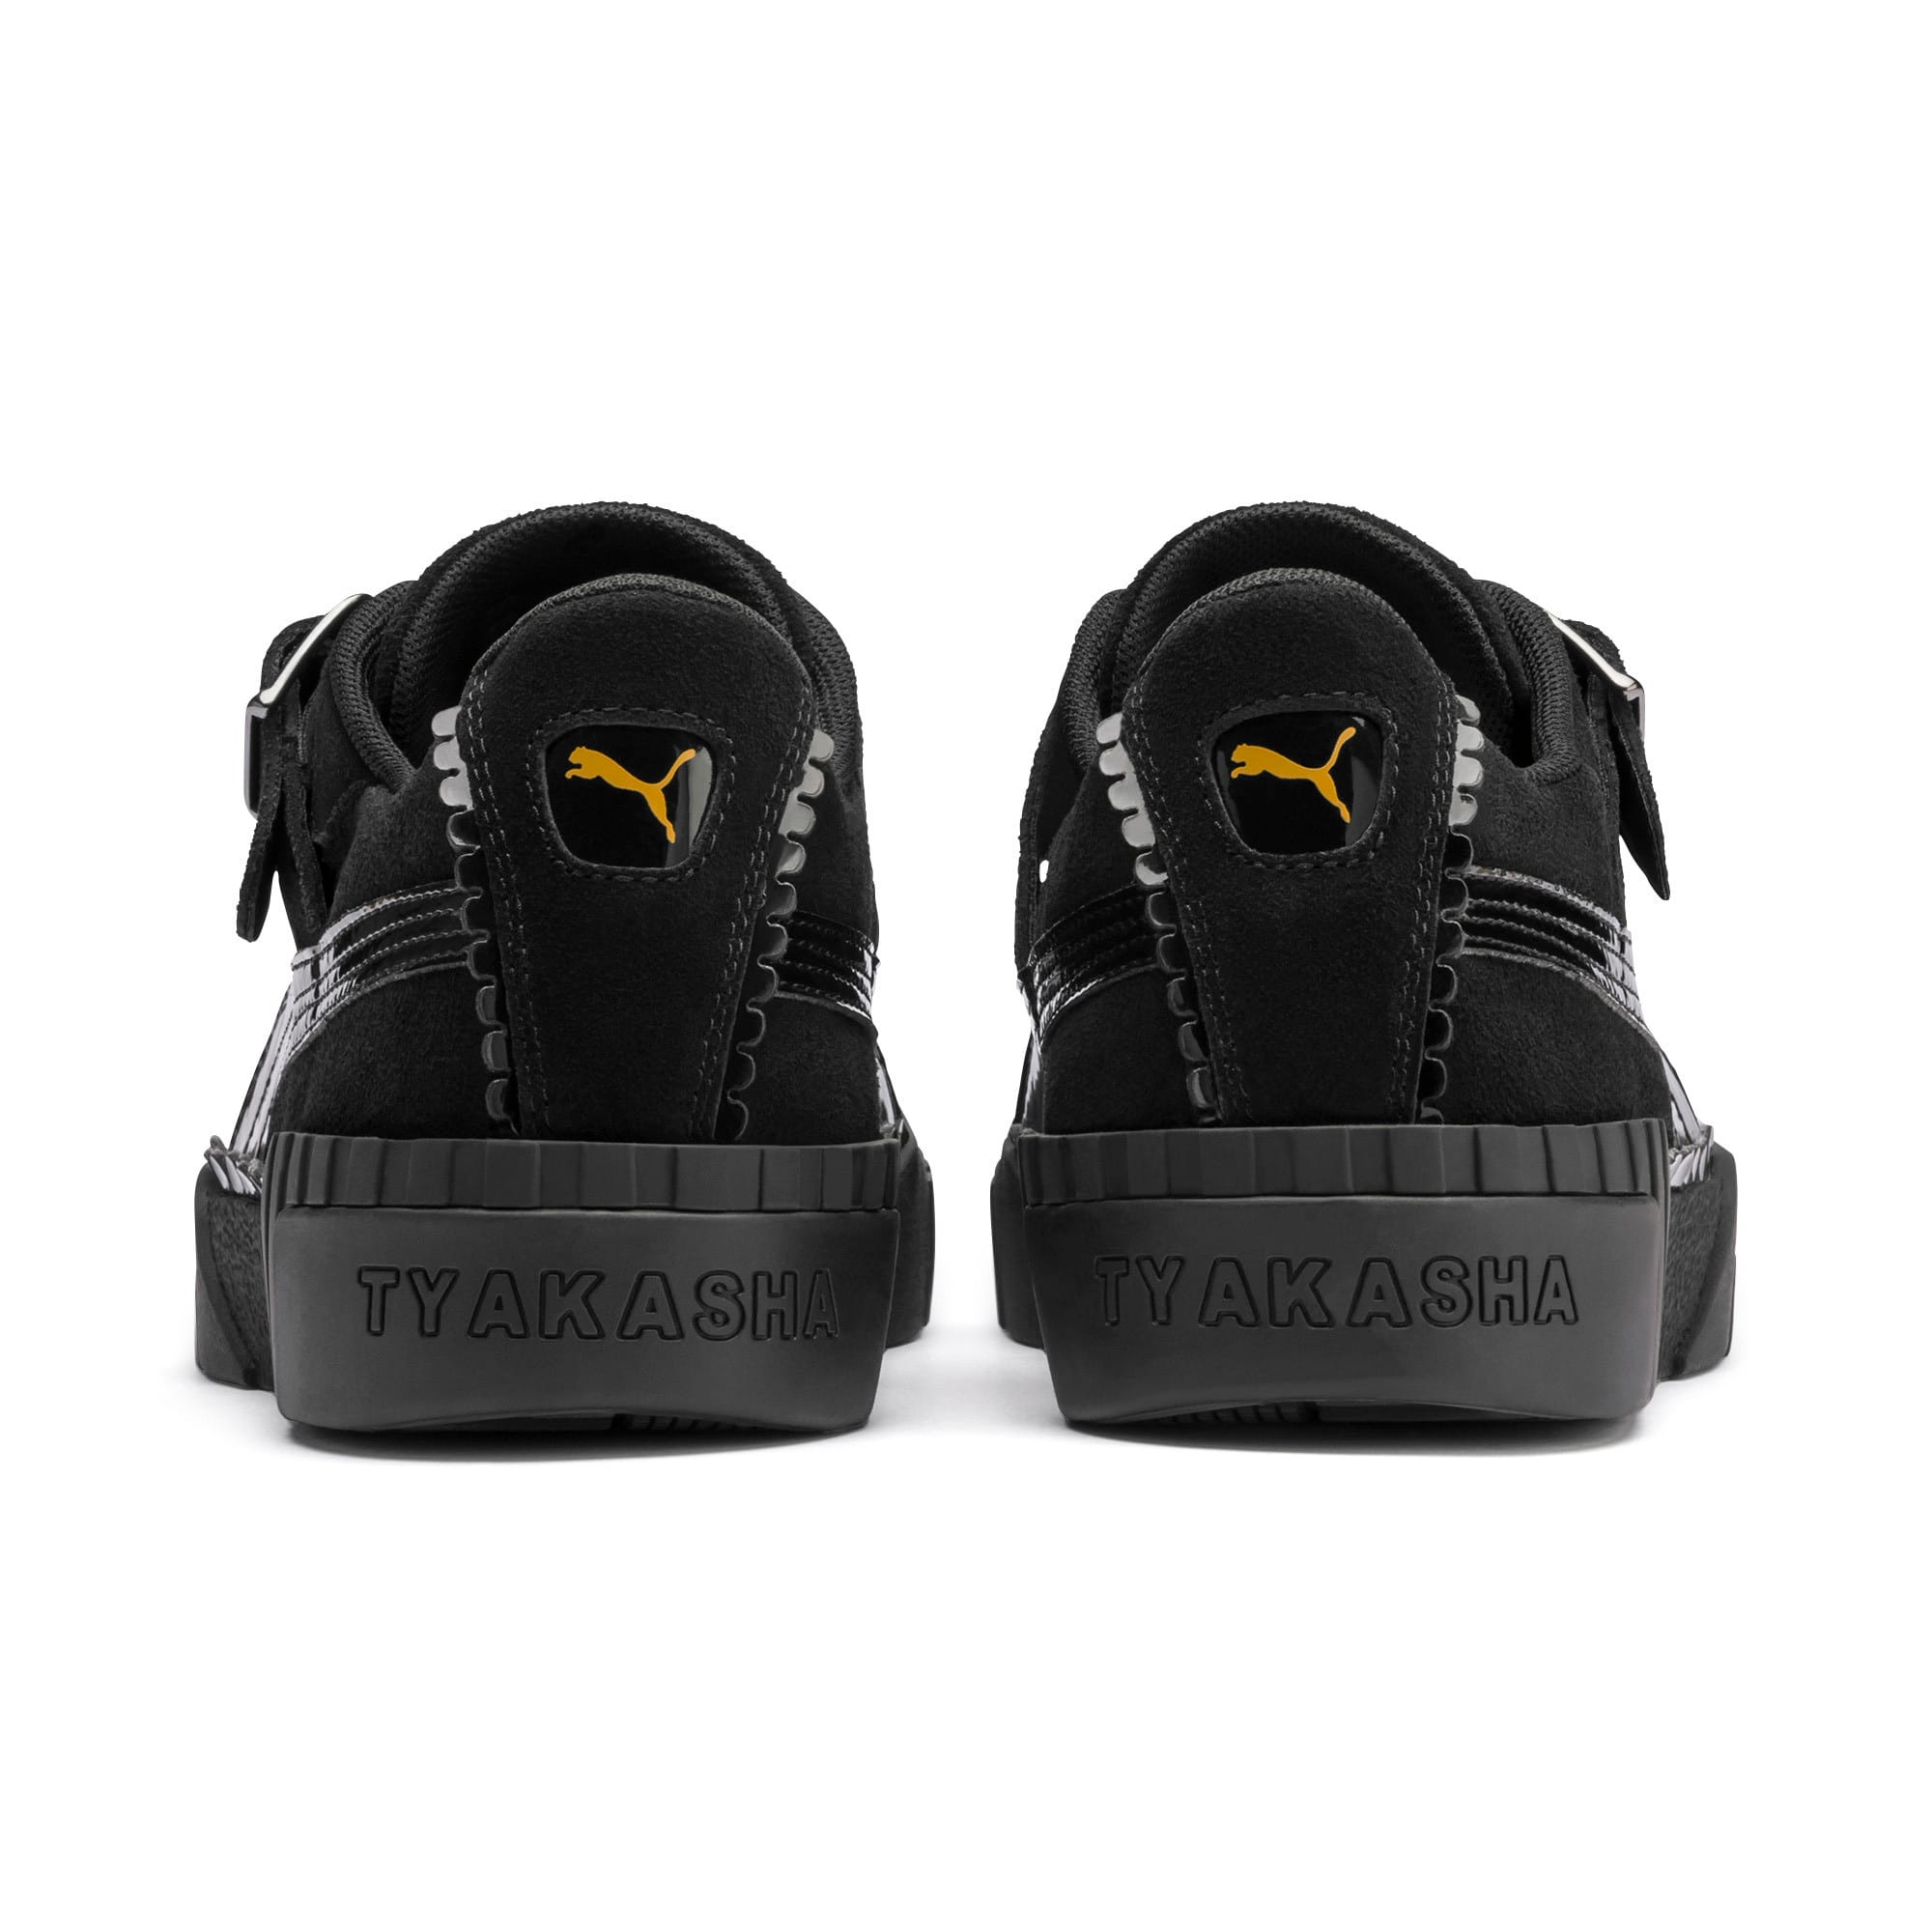 Thumbnail 4 of PUMA x TYAKASHA Cali Women's Sneakers, Puma Black, medium